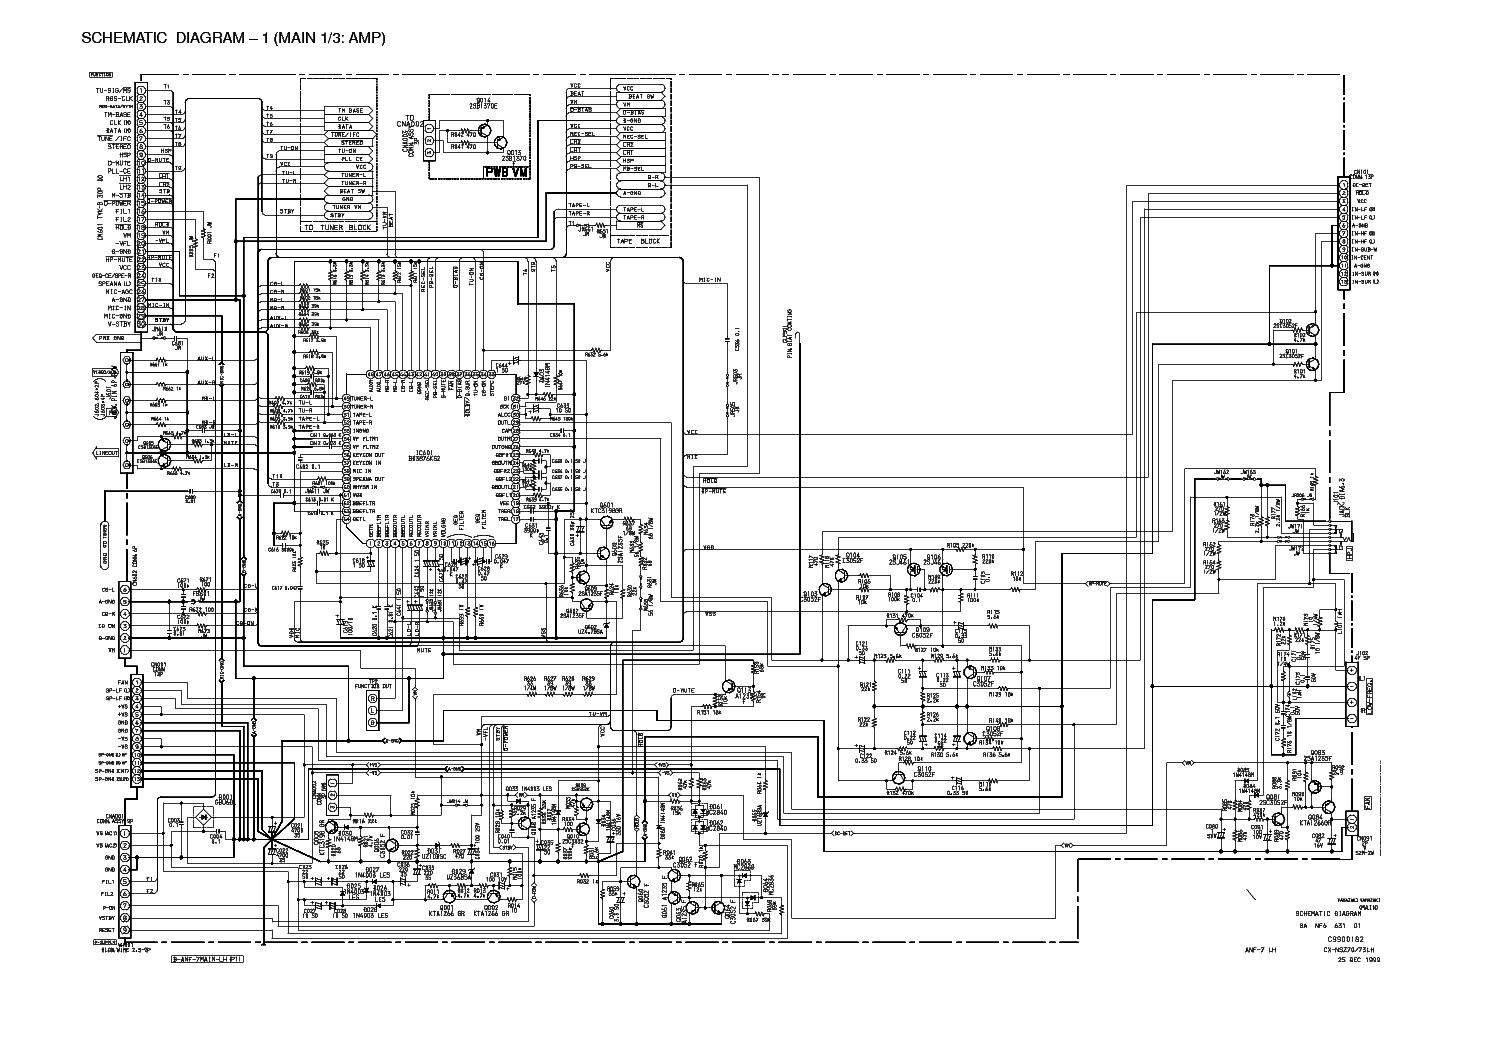 Aiwa nsx-r20 схема